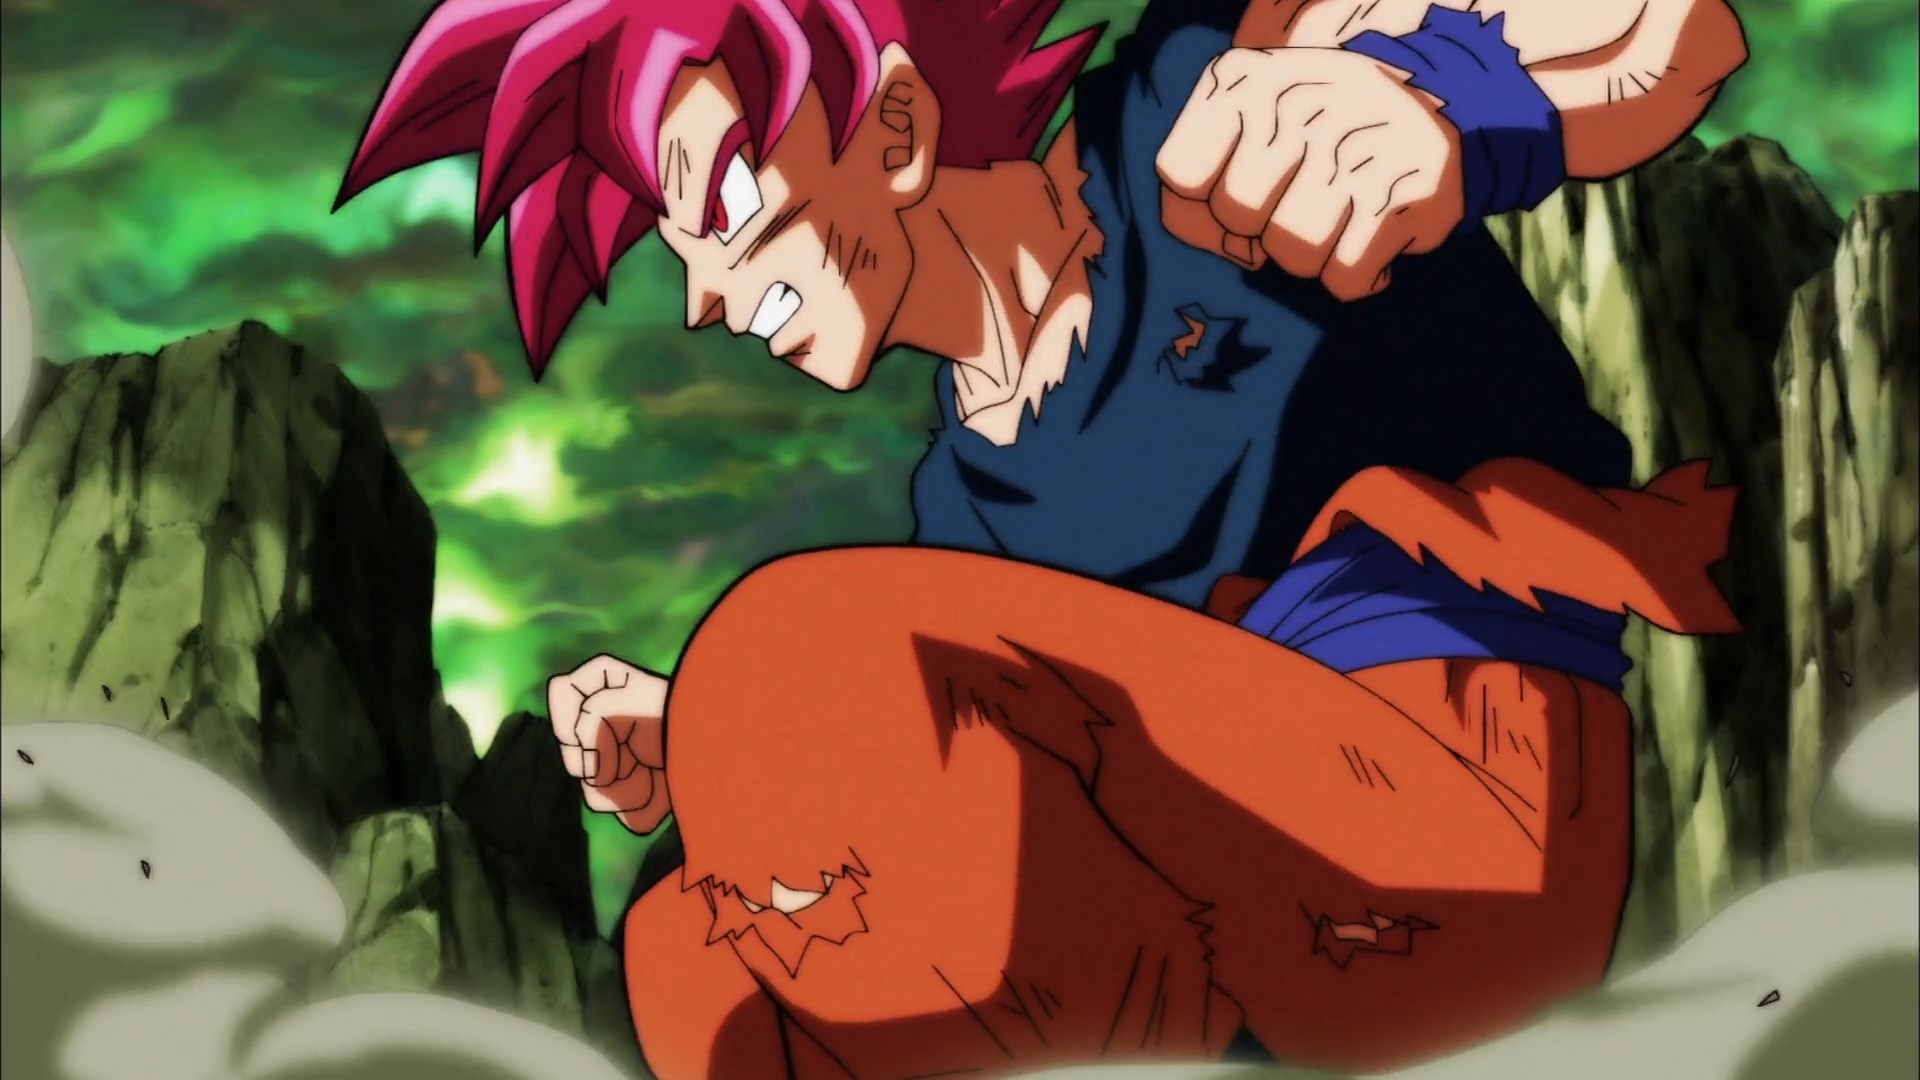 [HorribleSubs] Dragon Ball Super - 121 [1080p].mkv_snapshot_09.14